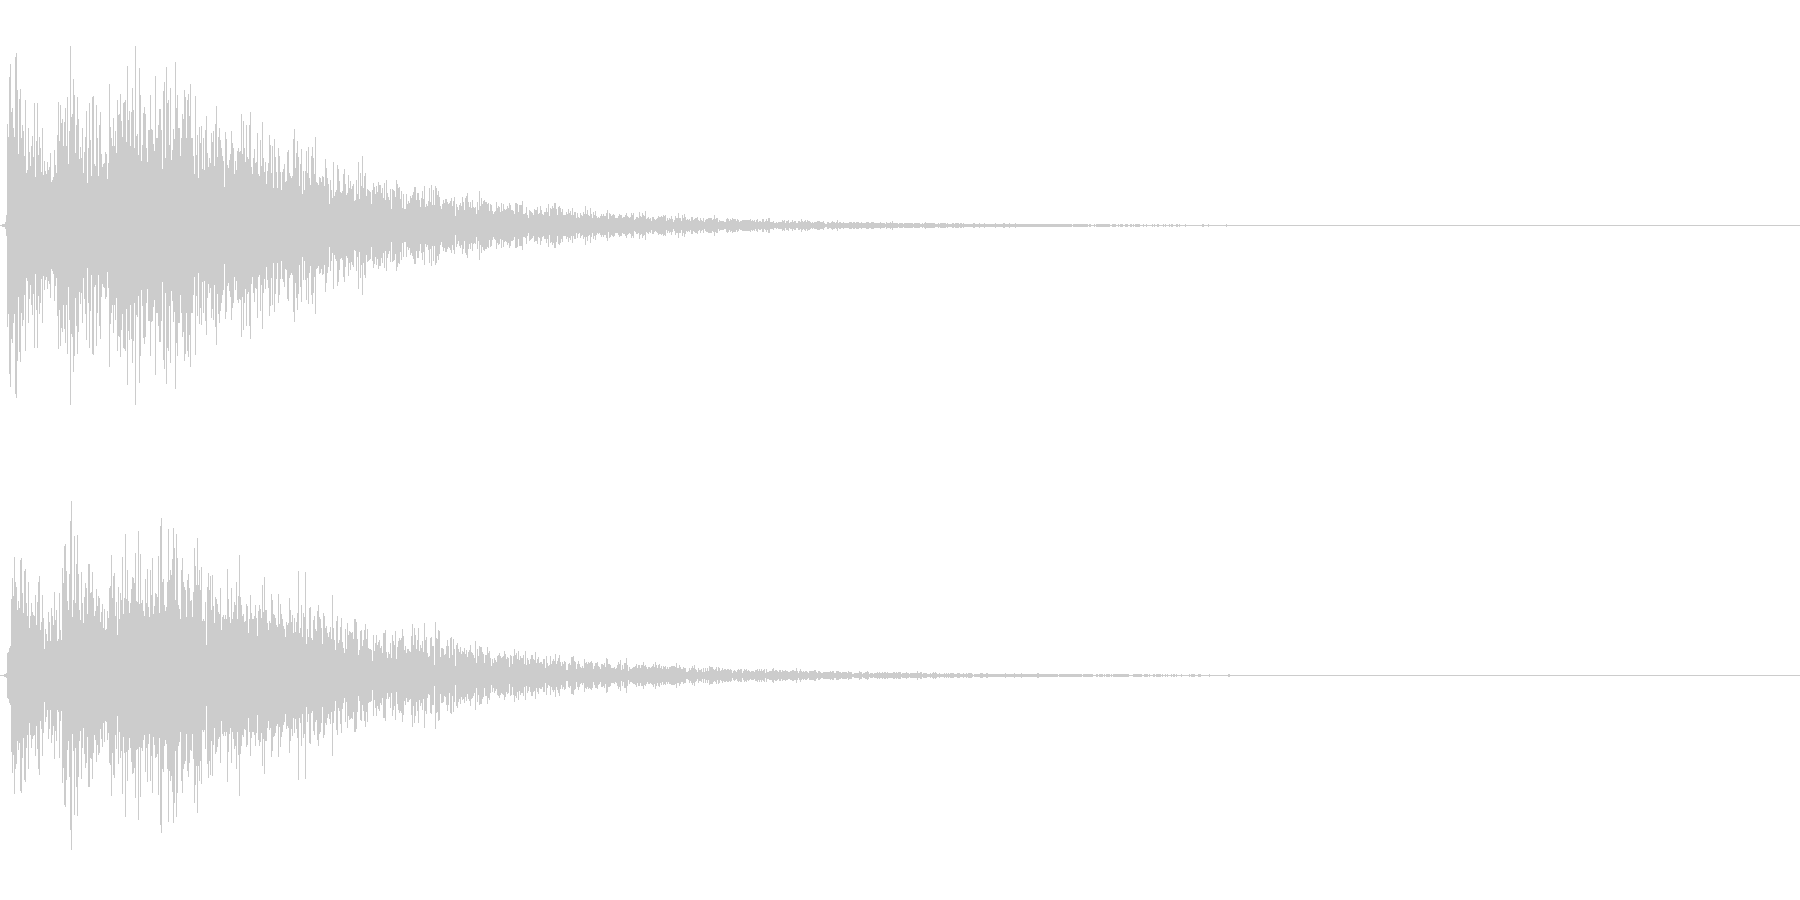 Dark_Attack-33_Delayの未再生の波形